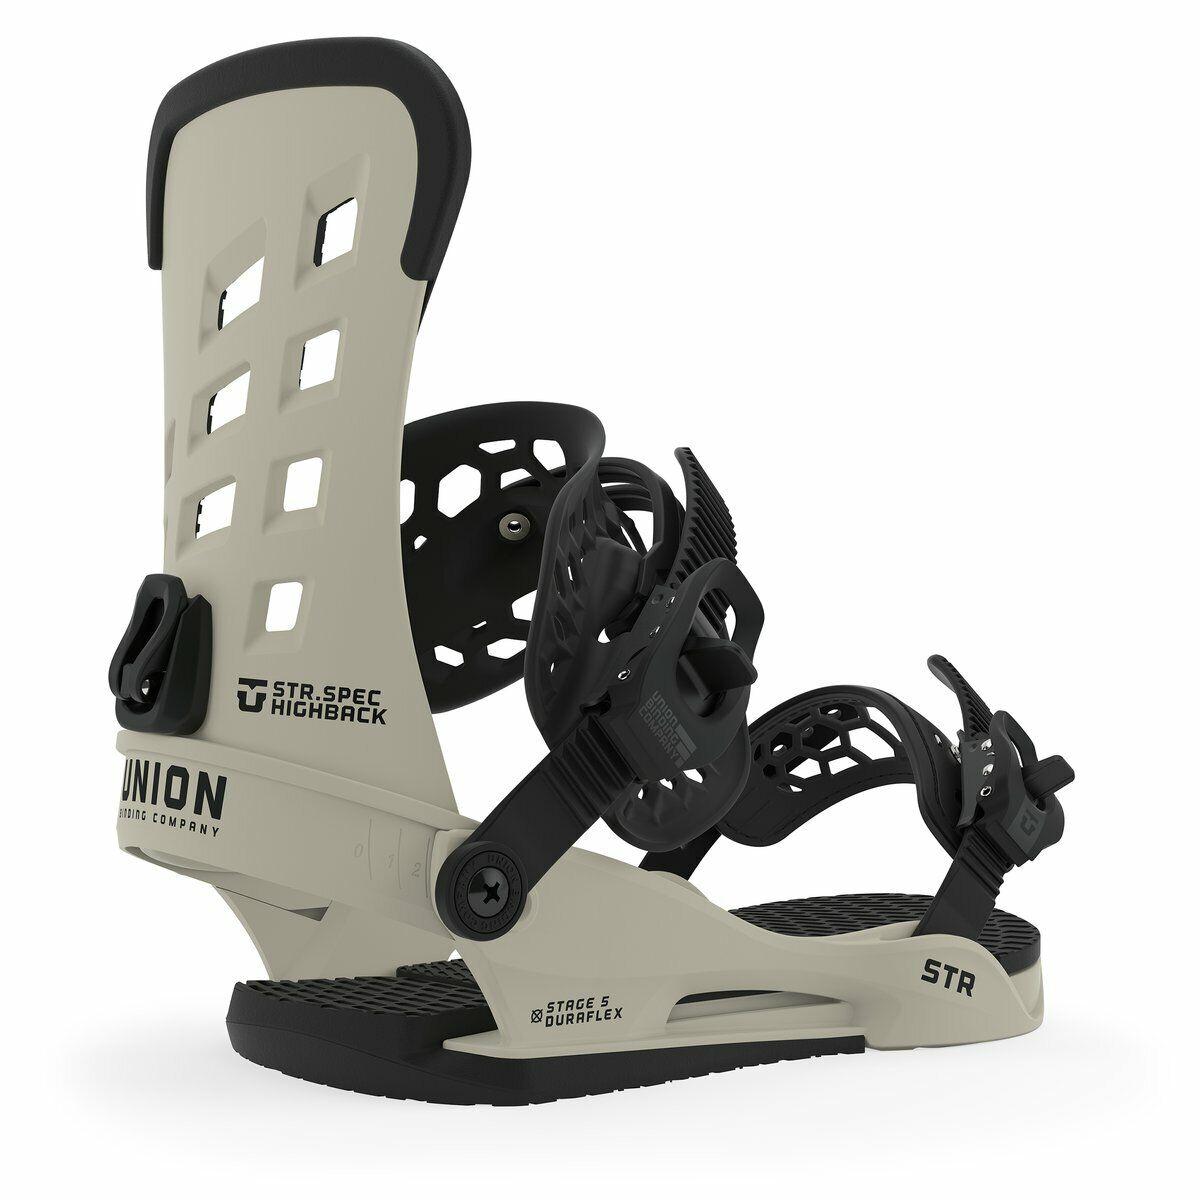 Union STR 2020 Mens Snowboard Bindings Bone